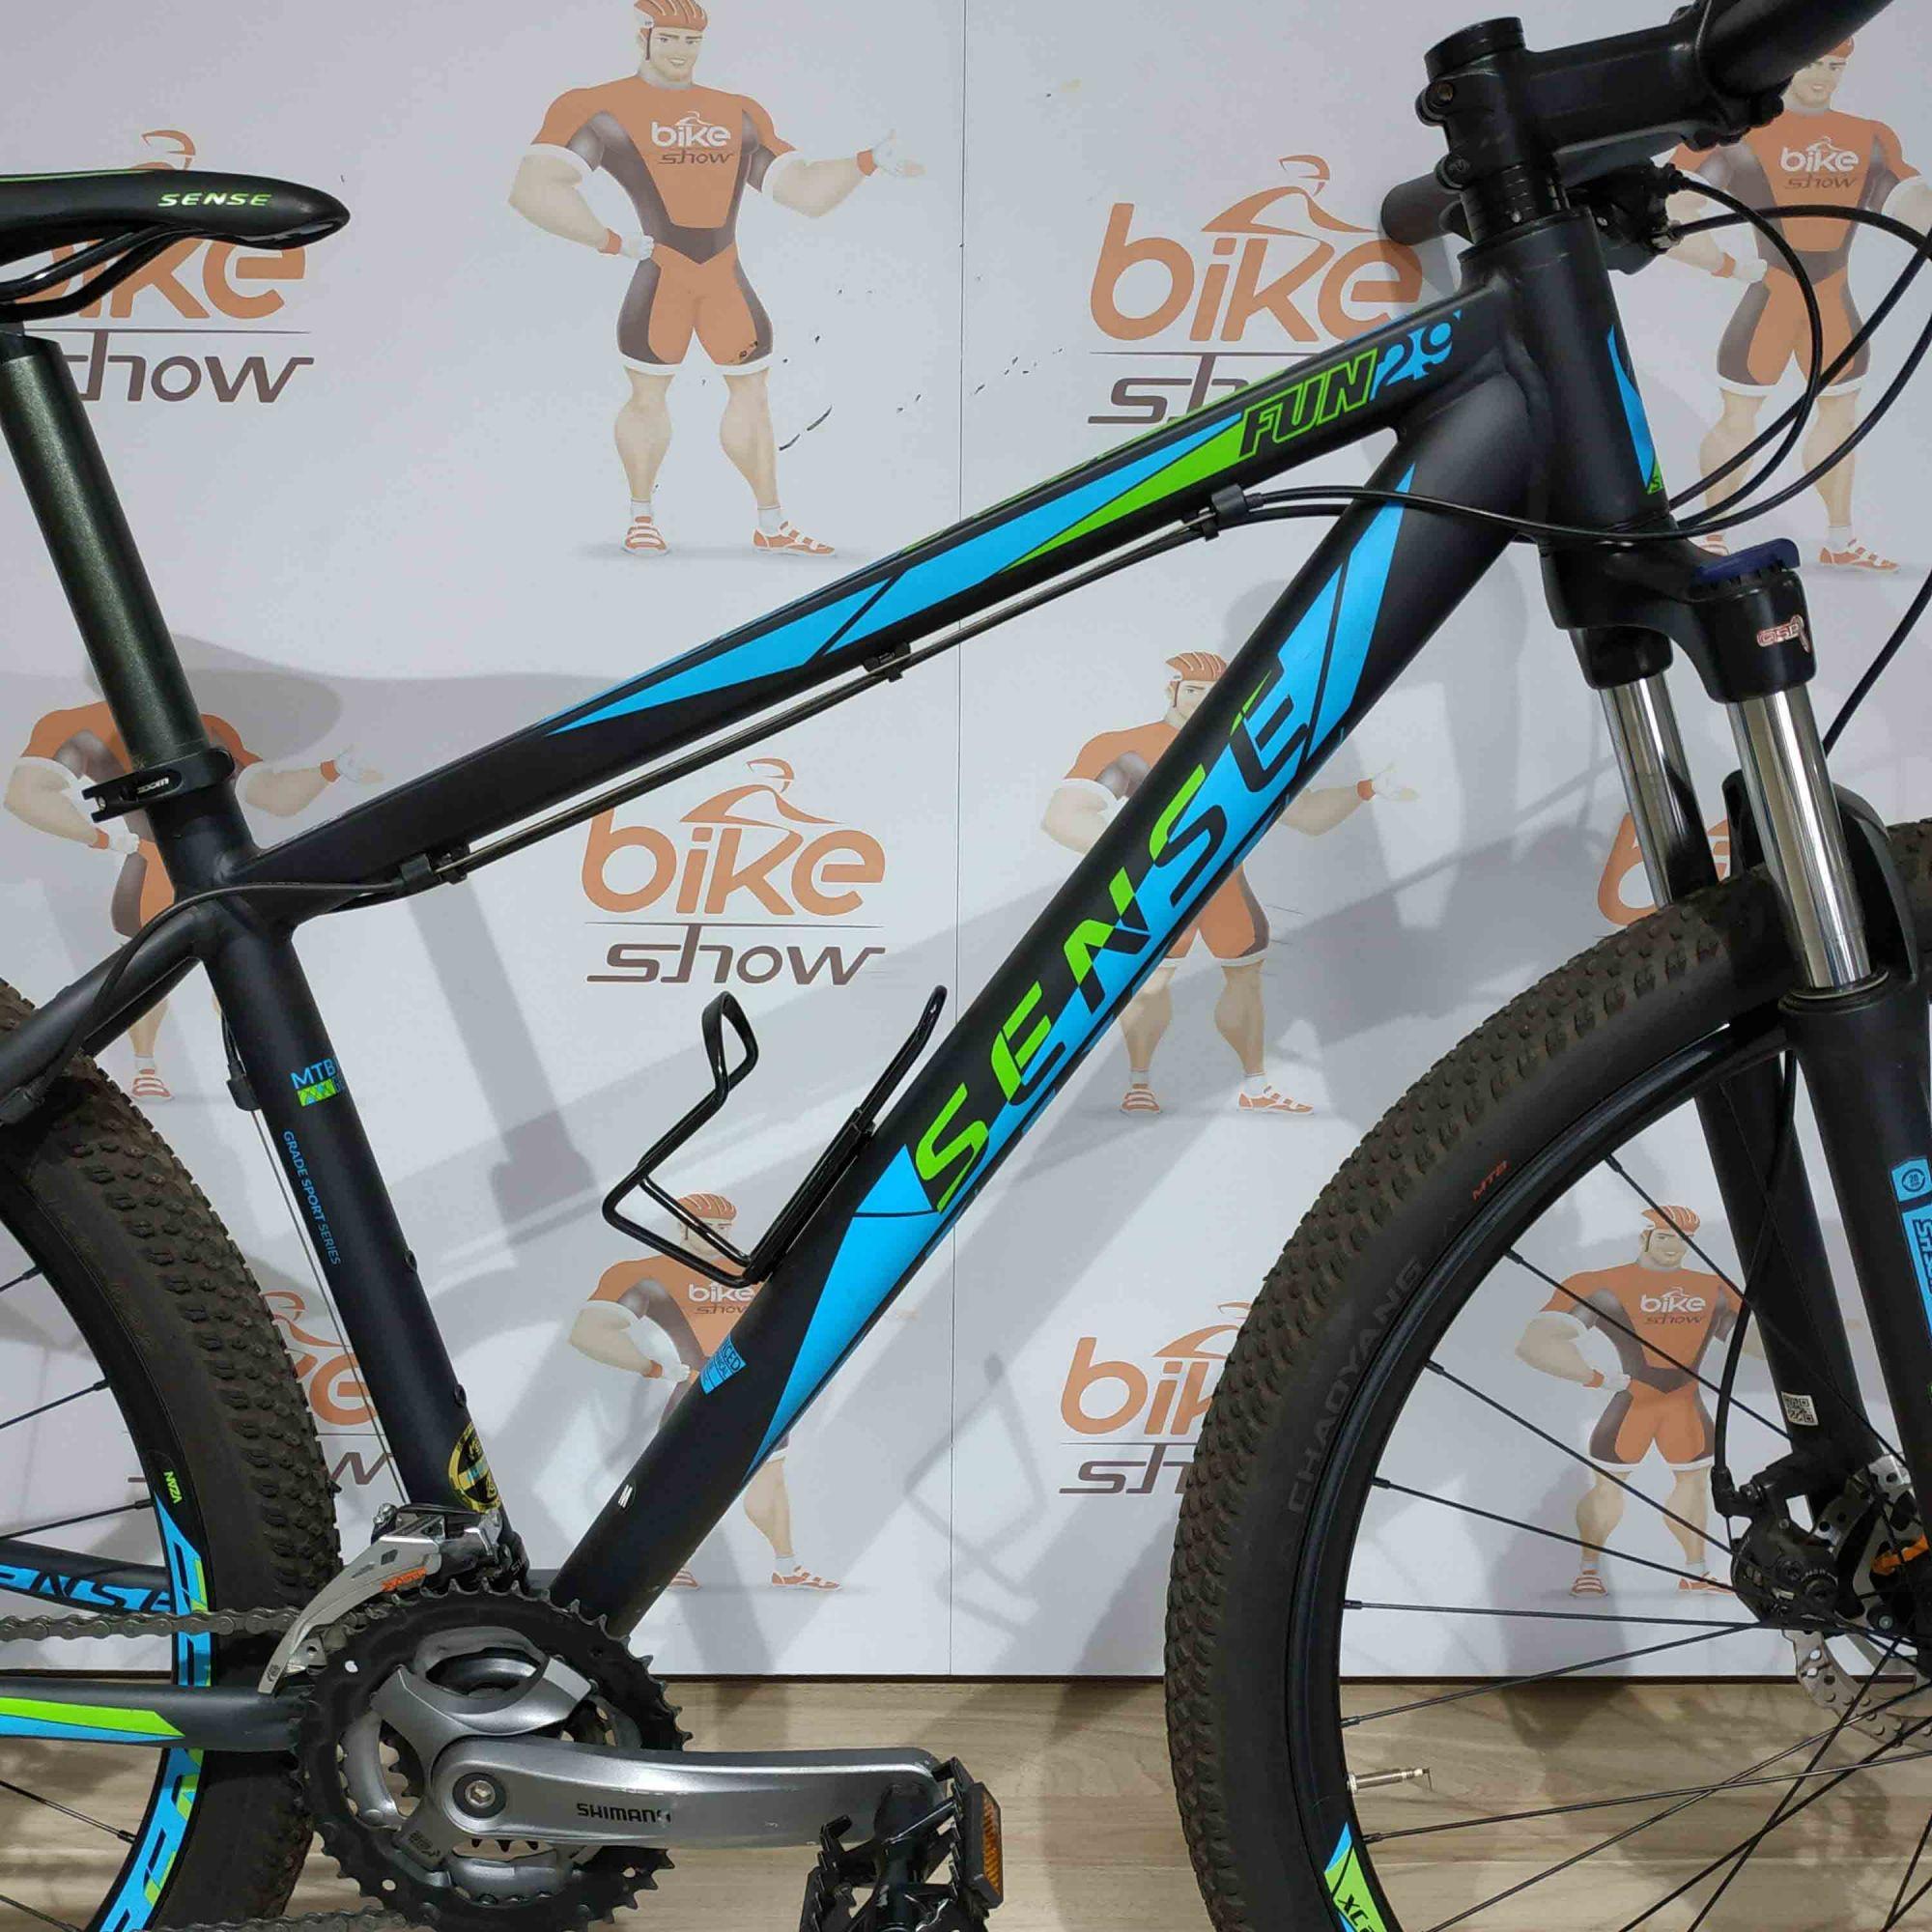 Bicicleta SENSE Fun 2018 aro 29 SEMINOVA - 24v Shimano Altus - Muito conservada